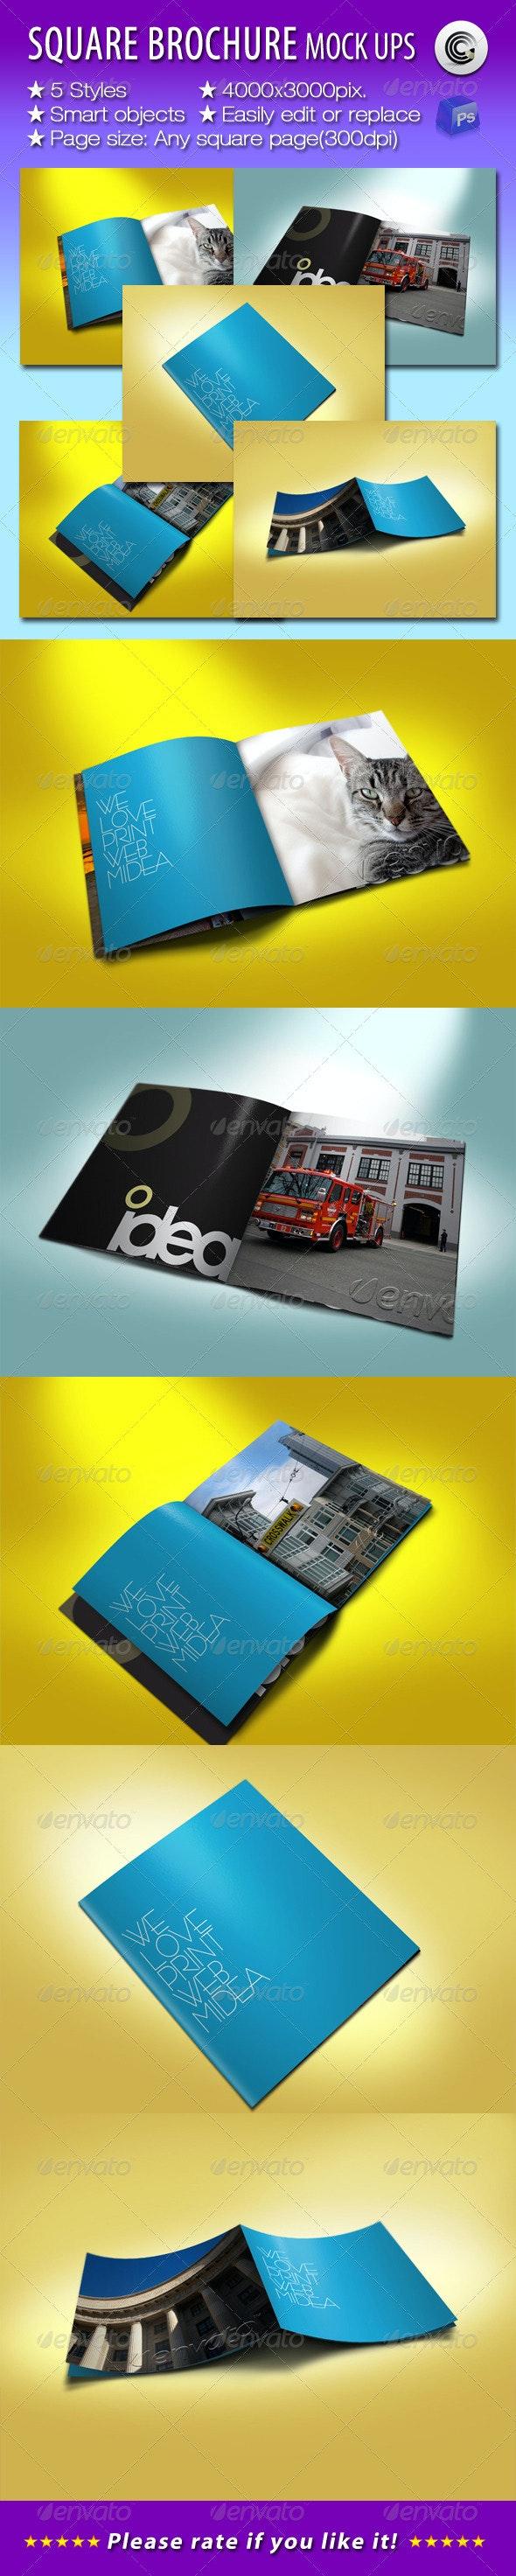 Square Brochures Preview Mock-ups - Brochures Print